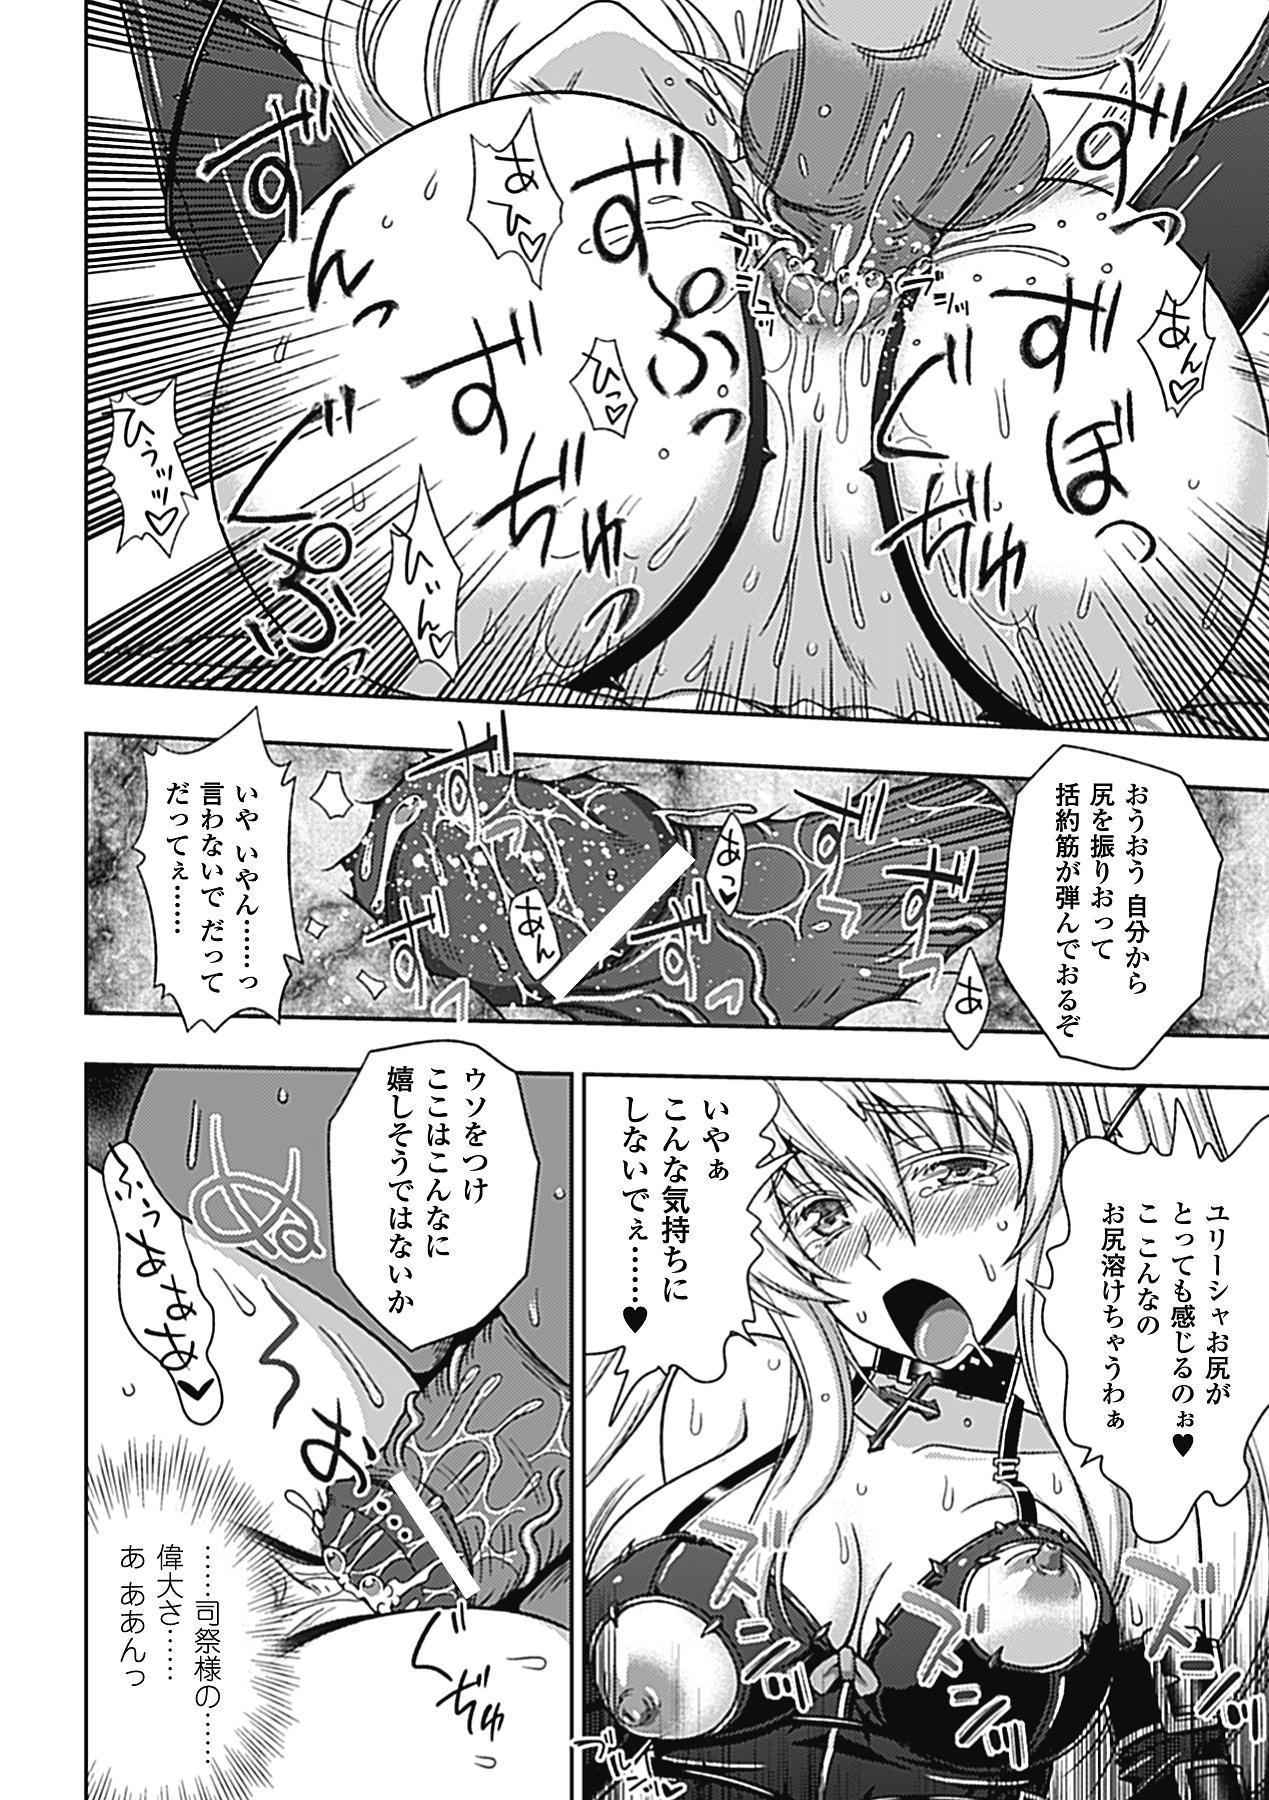 Megami Crisis 1 40